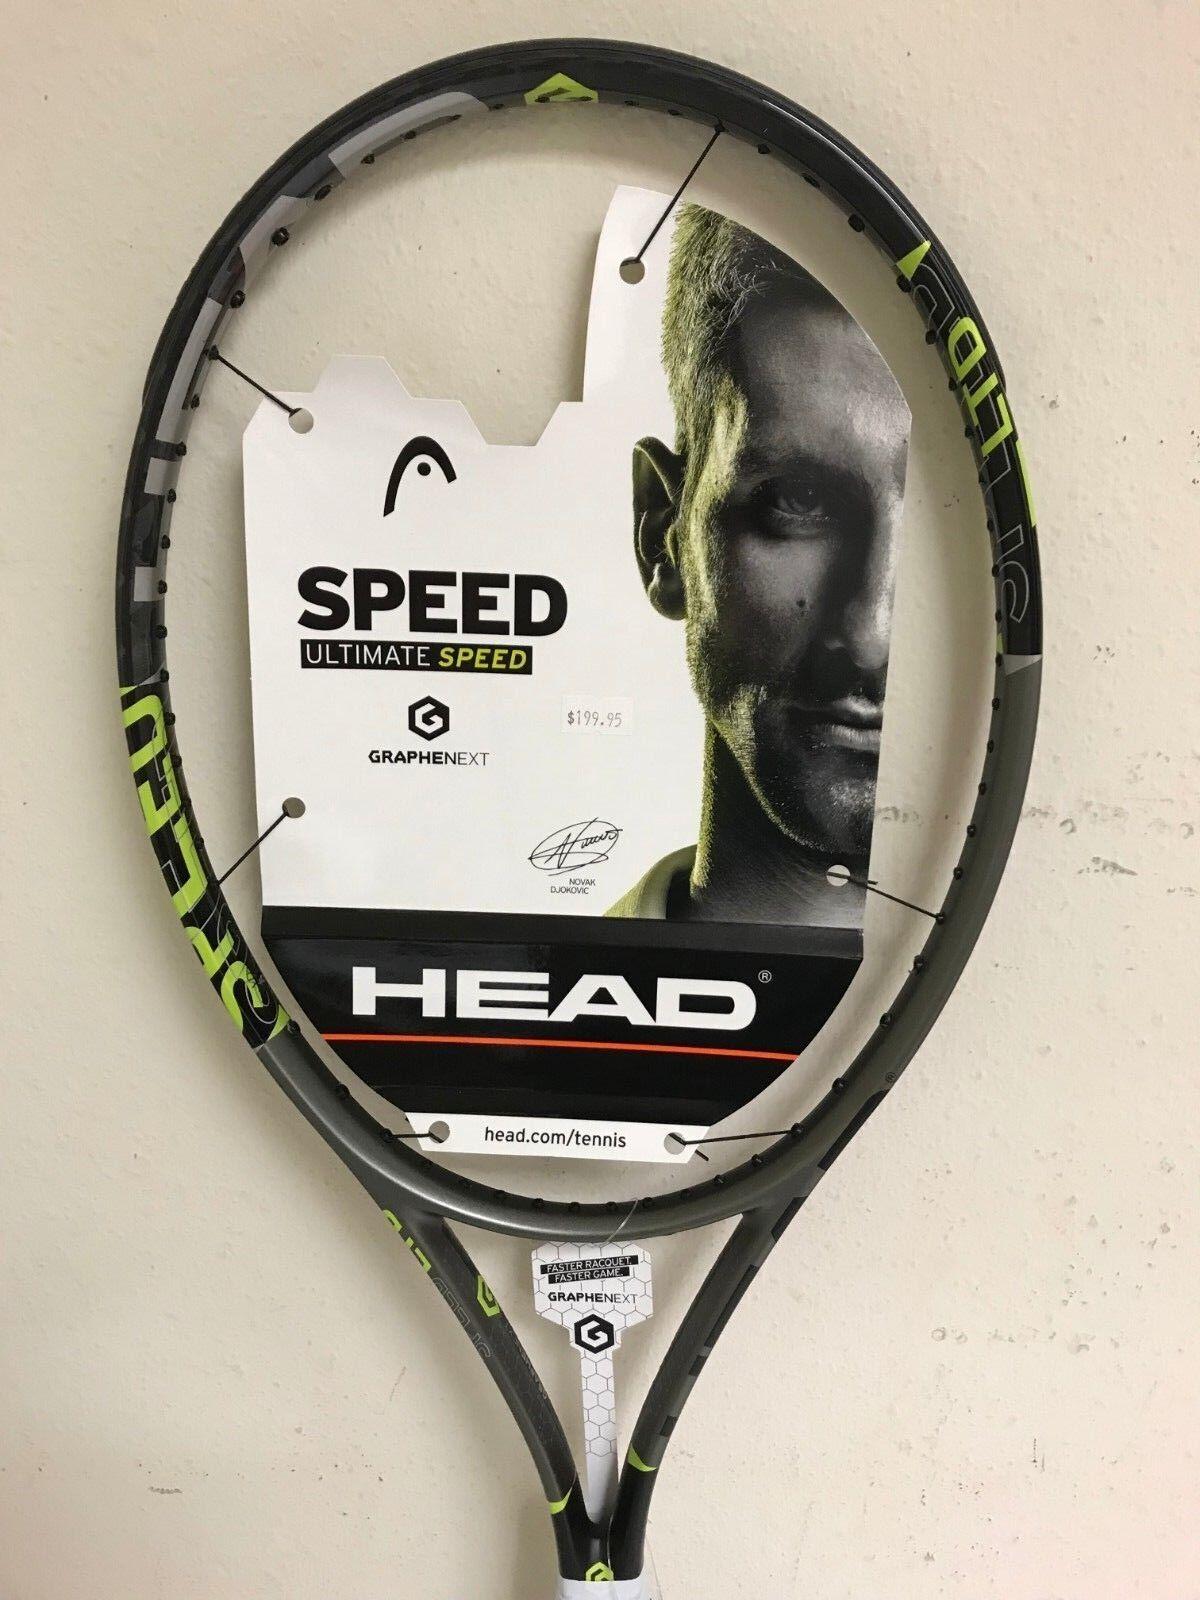 Head Graphene Velocidad Mp limitada Tenis Raqueta Agarre Talla 4 1 2